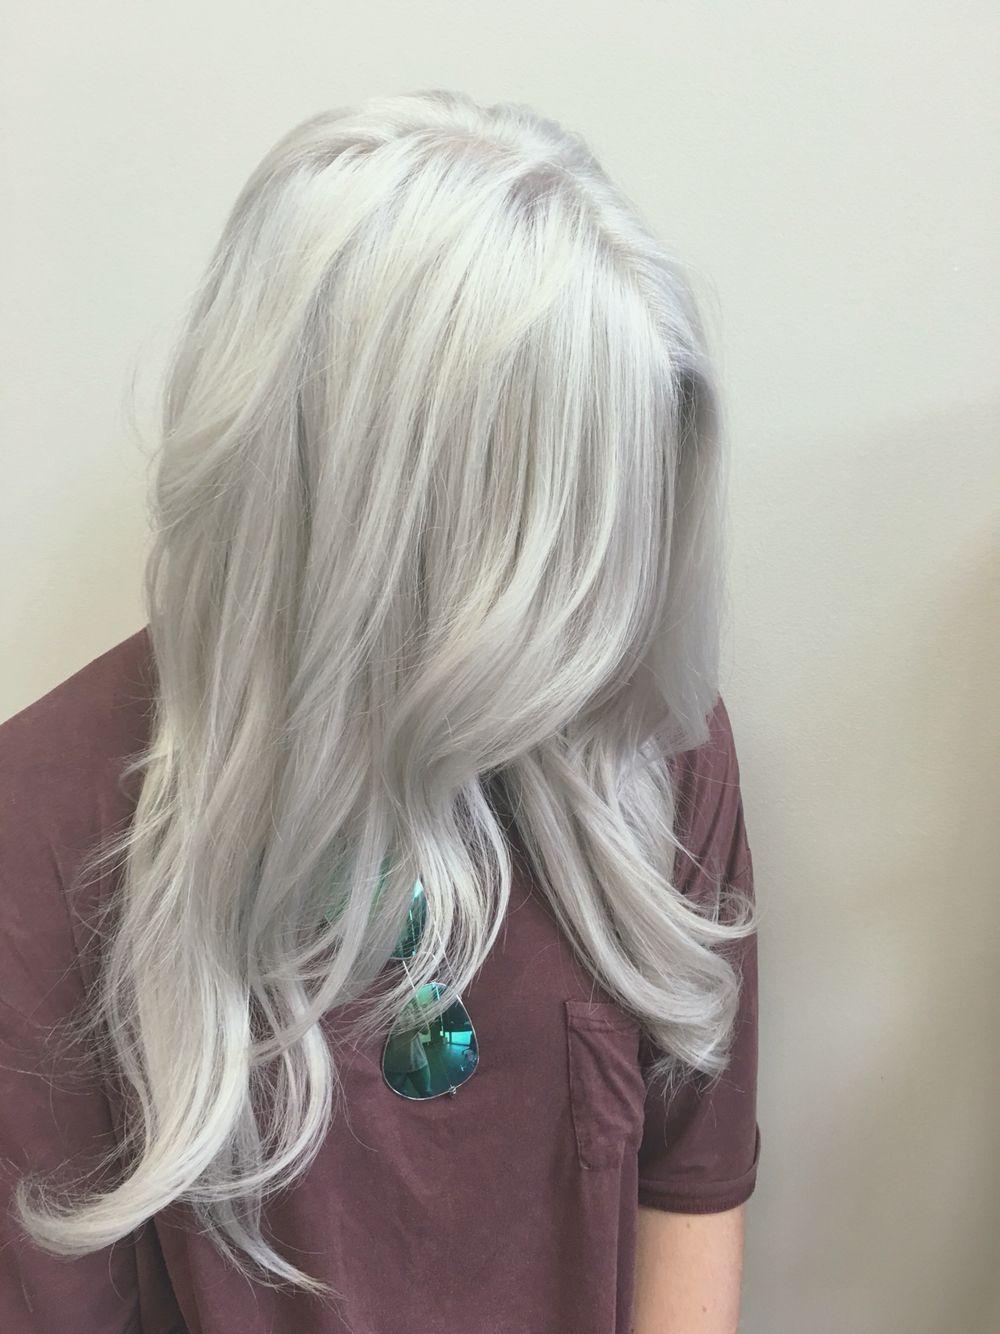 Silver Hair White Hair Gray Hair Old Lady Hair Color Hair Styles White Hair Color Platinum Blonde Hair